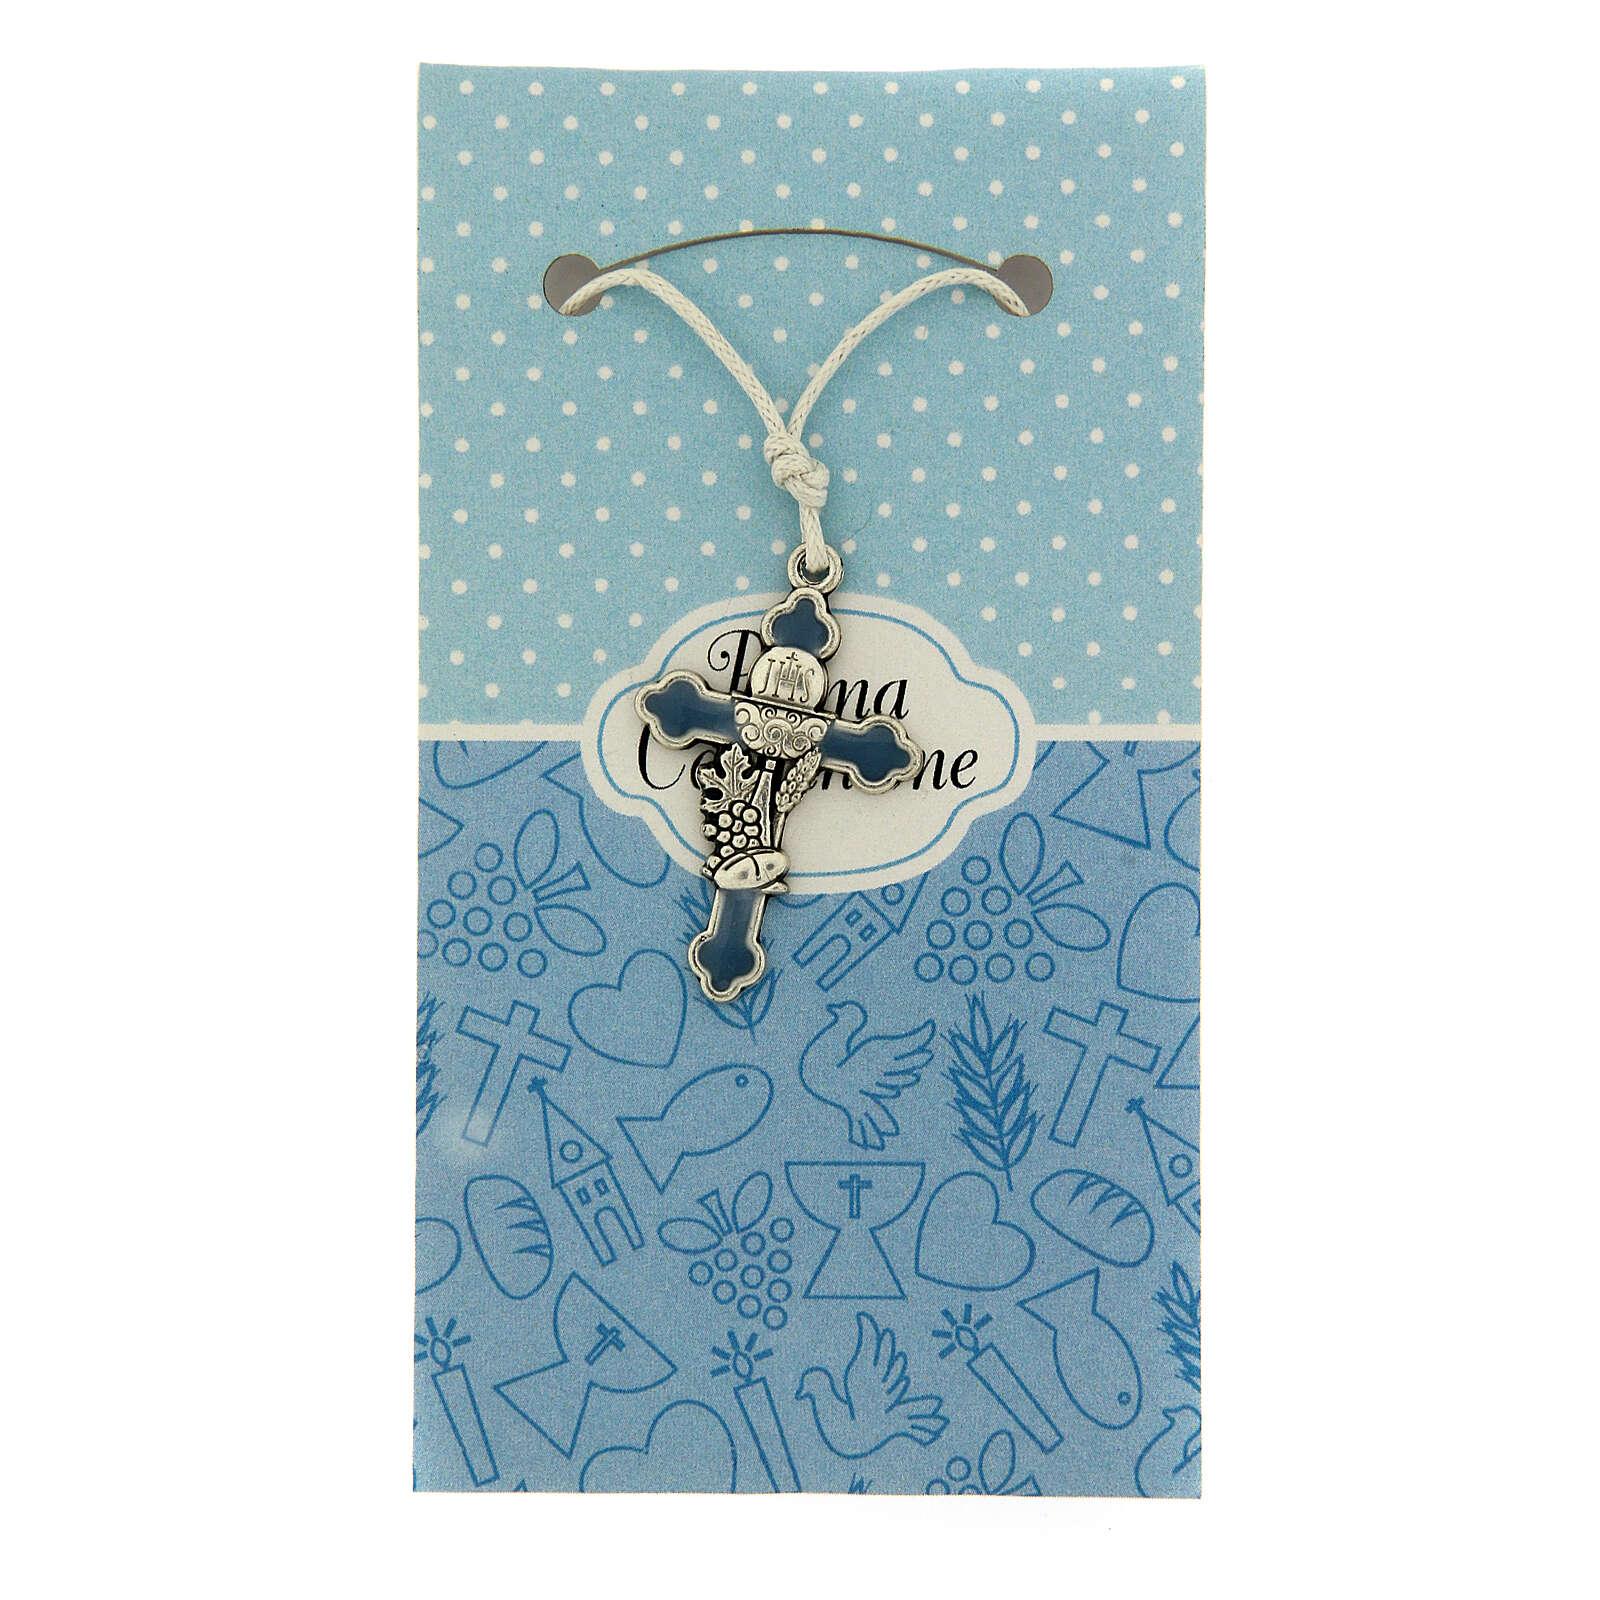 Communion cross pendant blue enamel 3